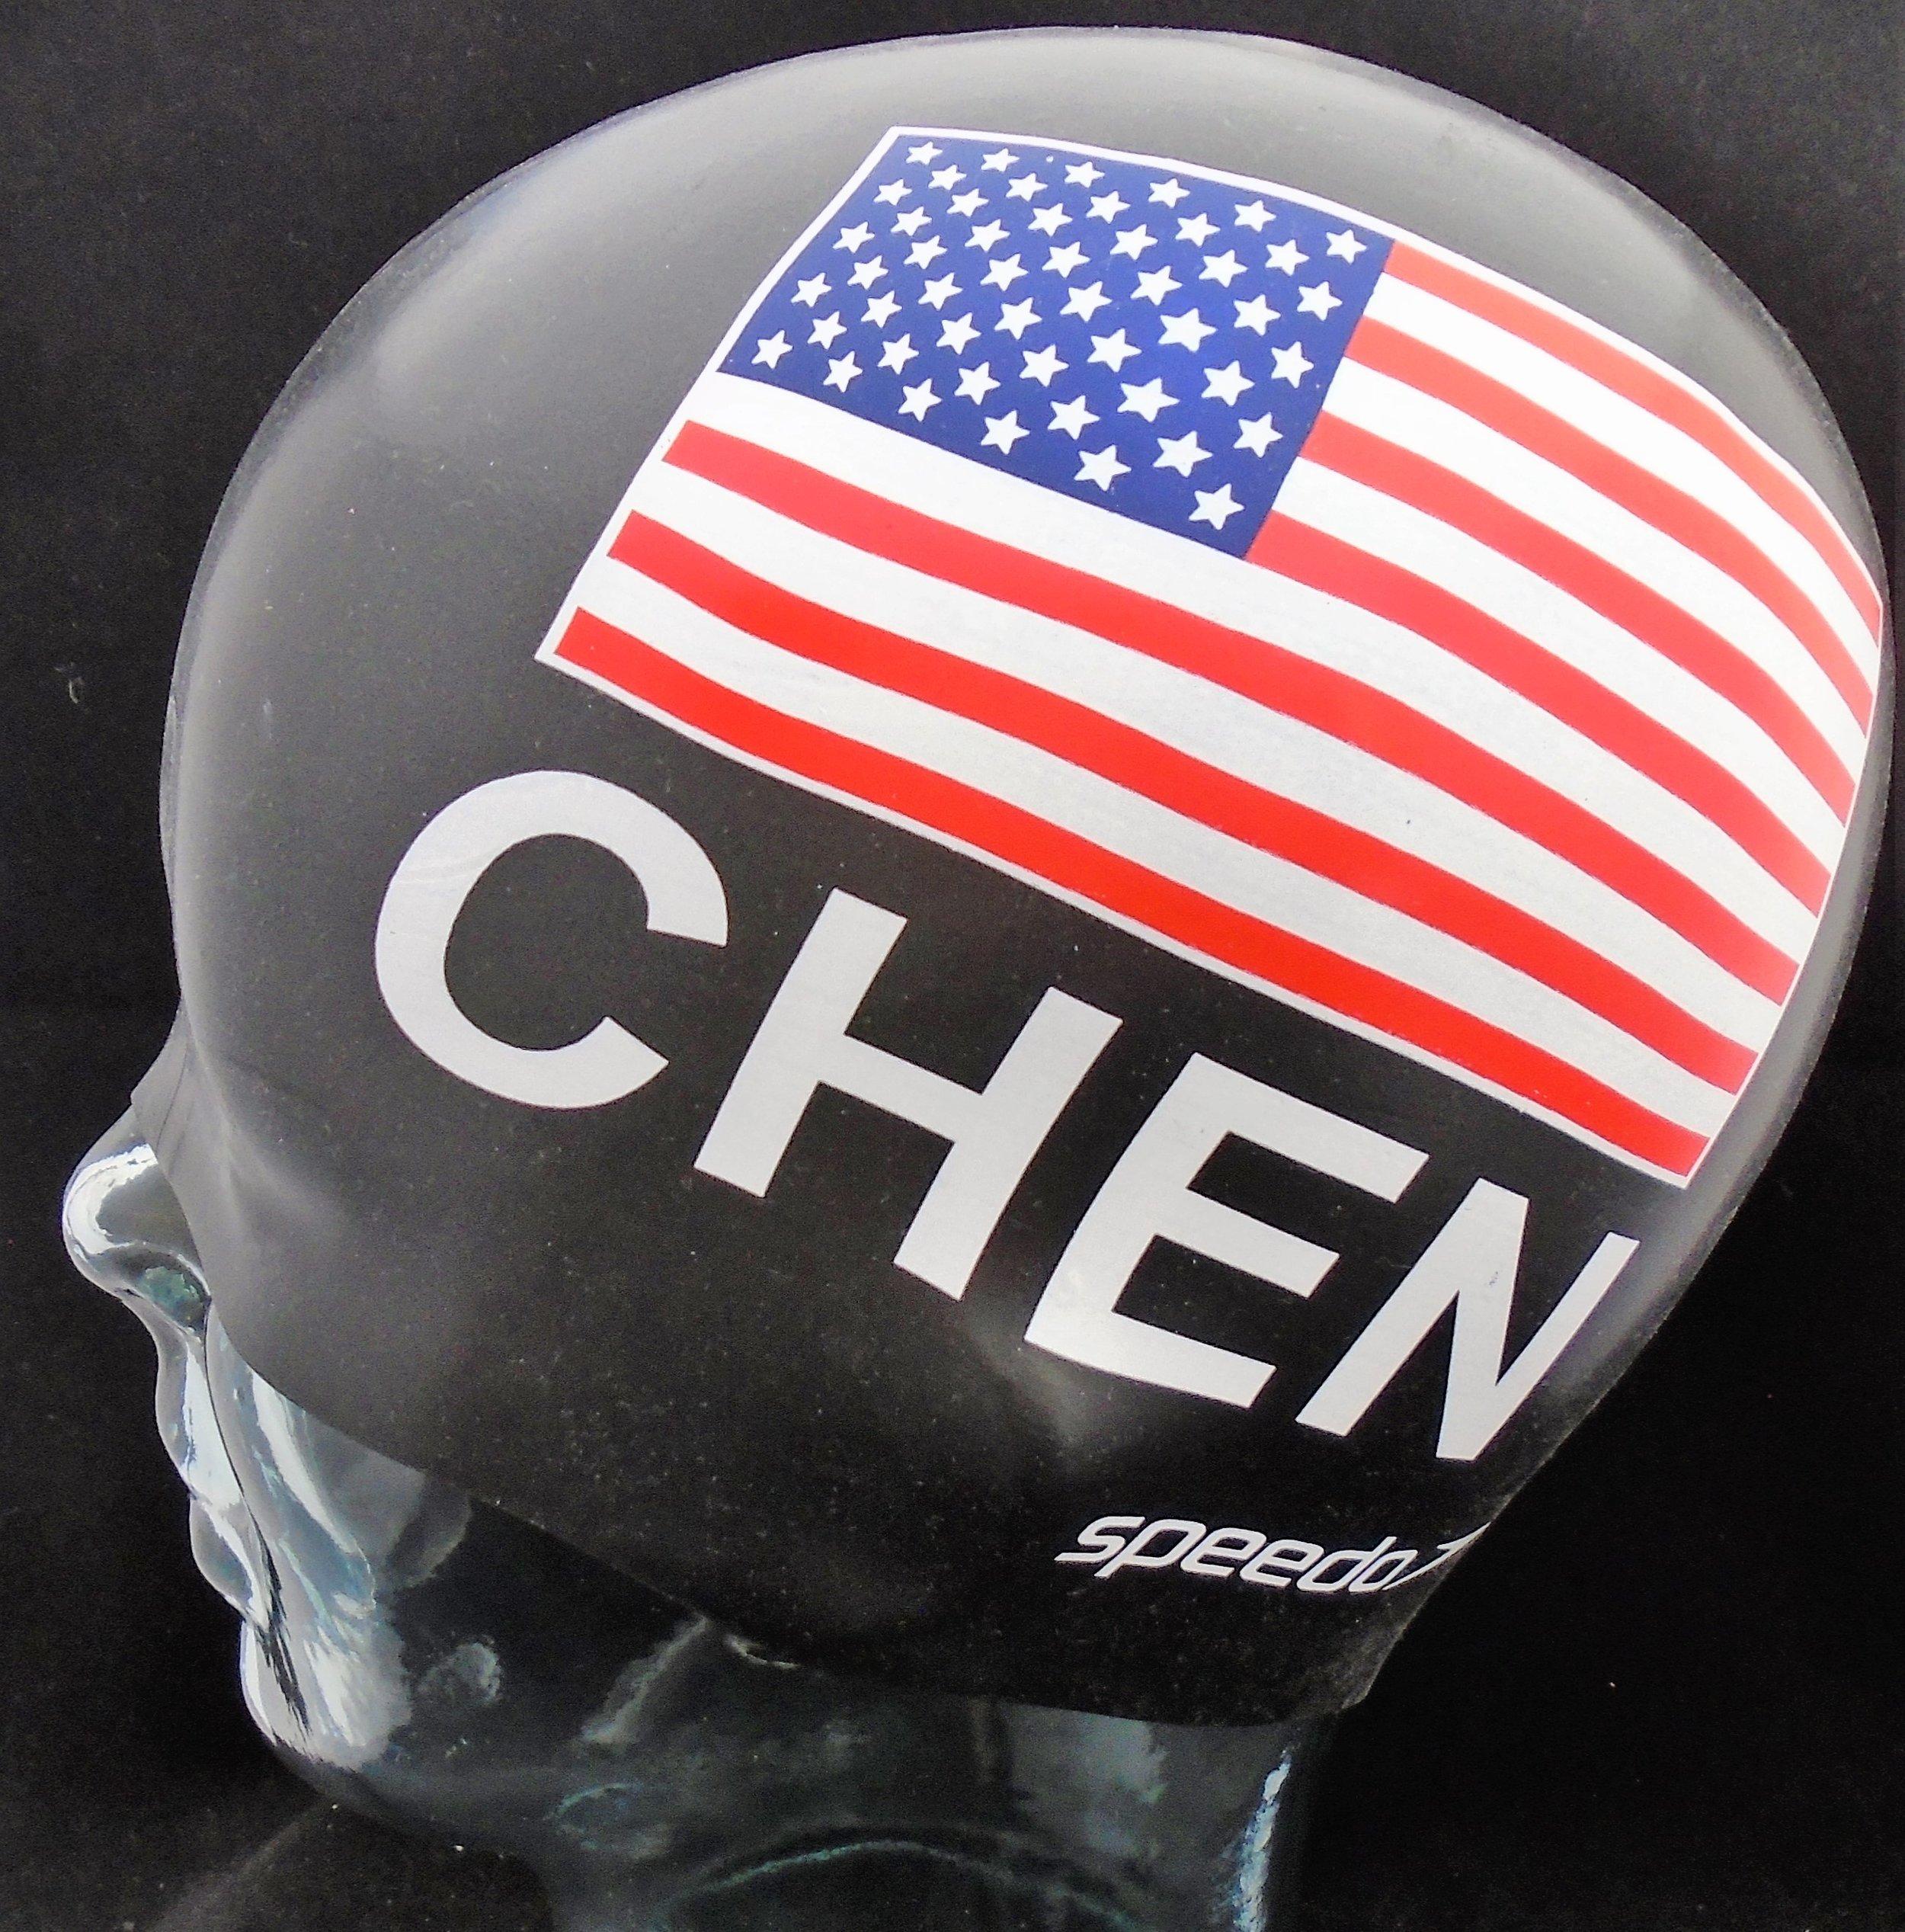 Chen USA Black.jpg